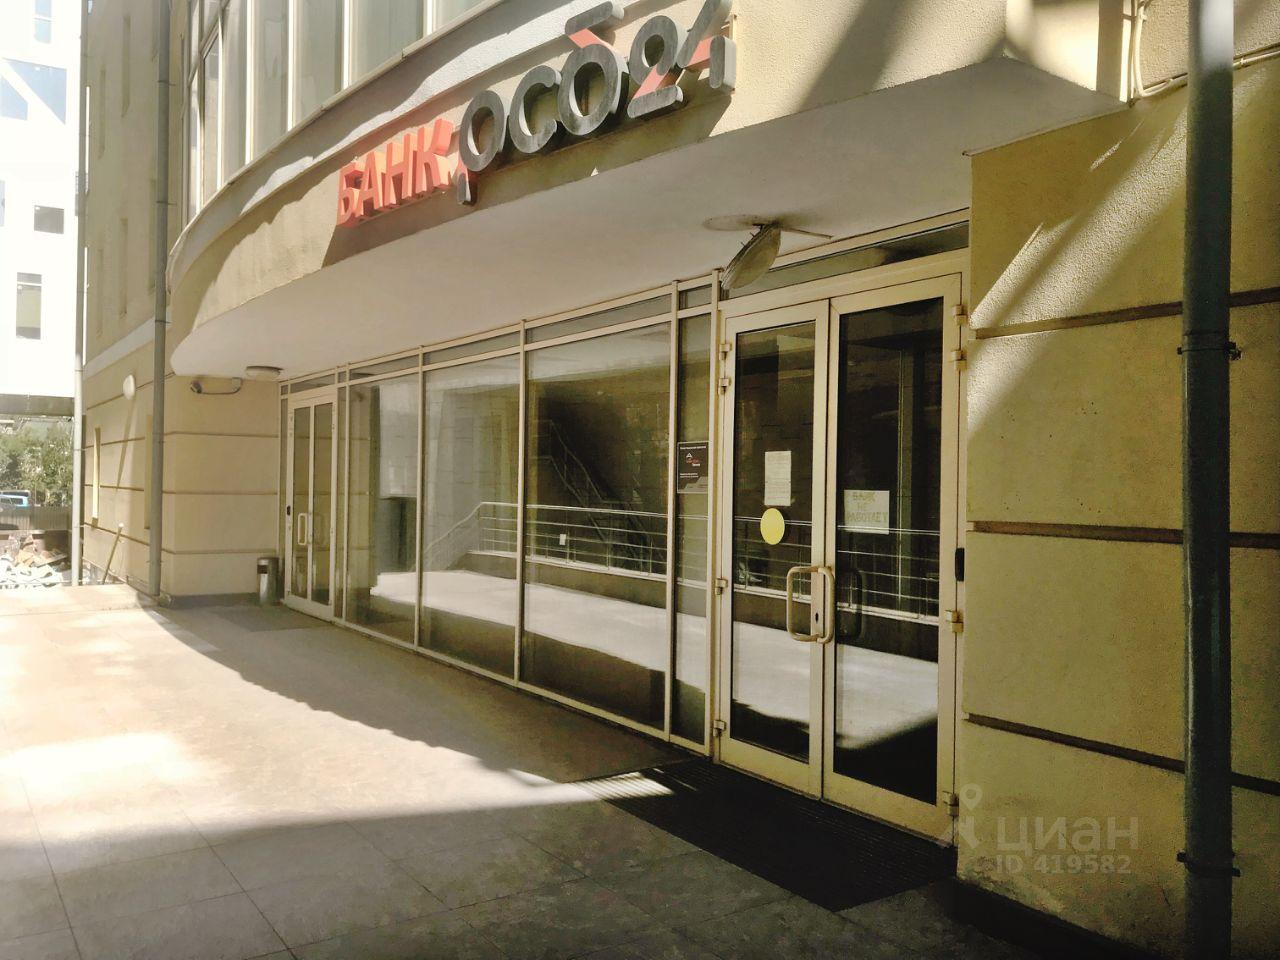 Аренда офиса в районе проспекта мира Аренда офиса 60 кв Монетчиковский 6-й переулок